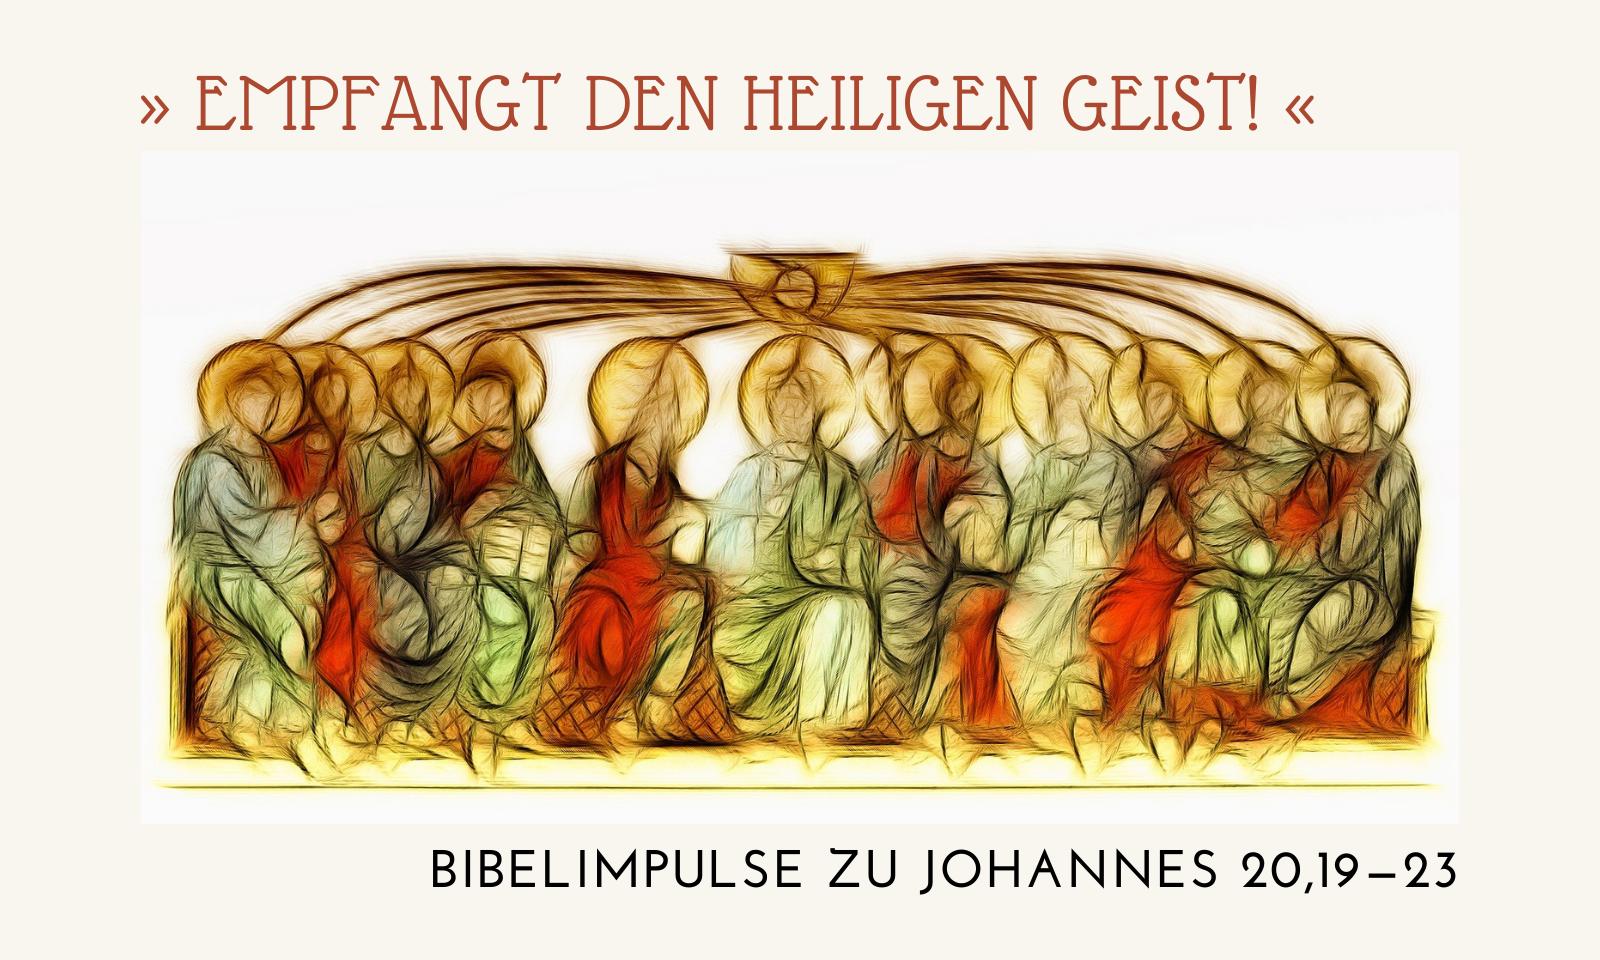 2021 05 Bibelimpuls